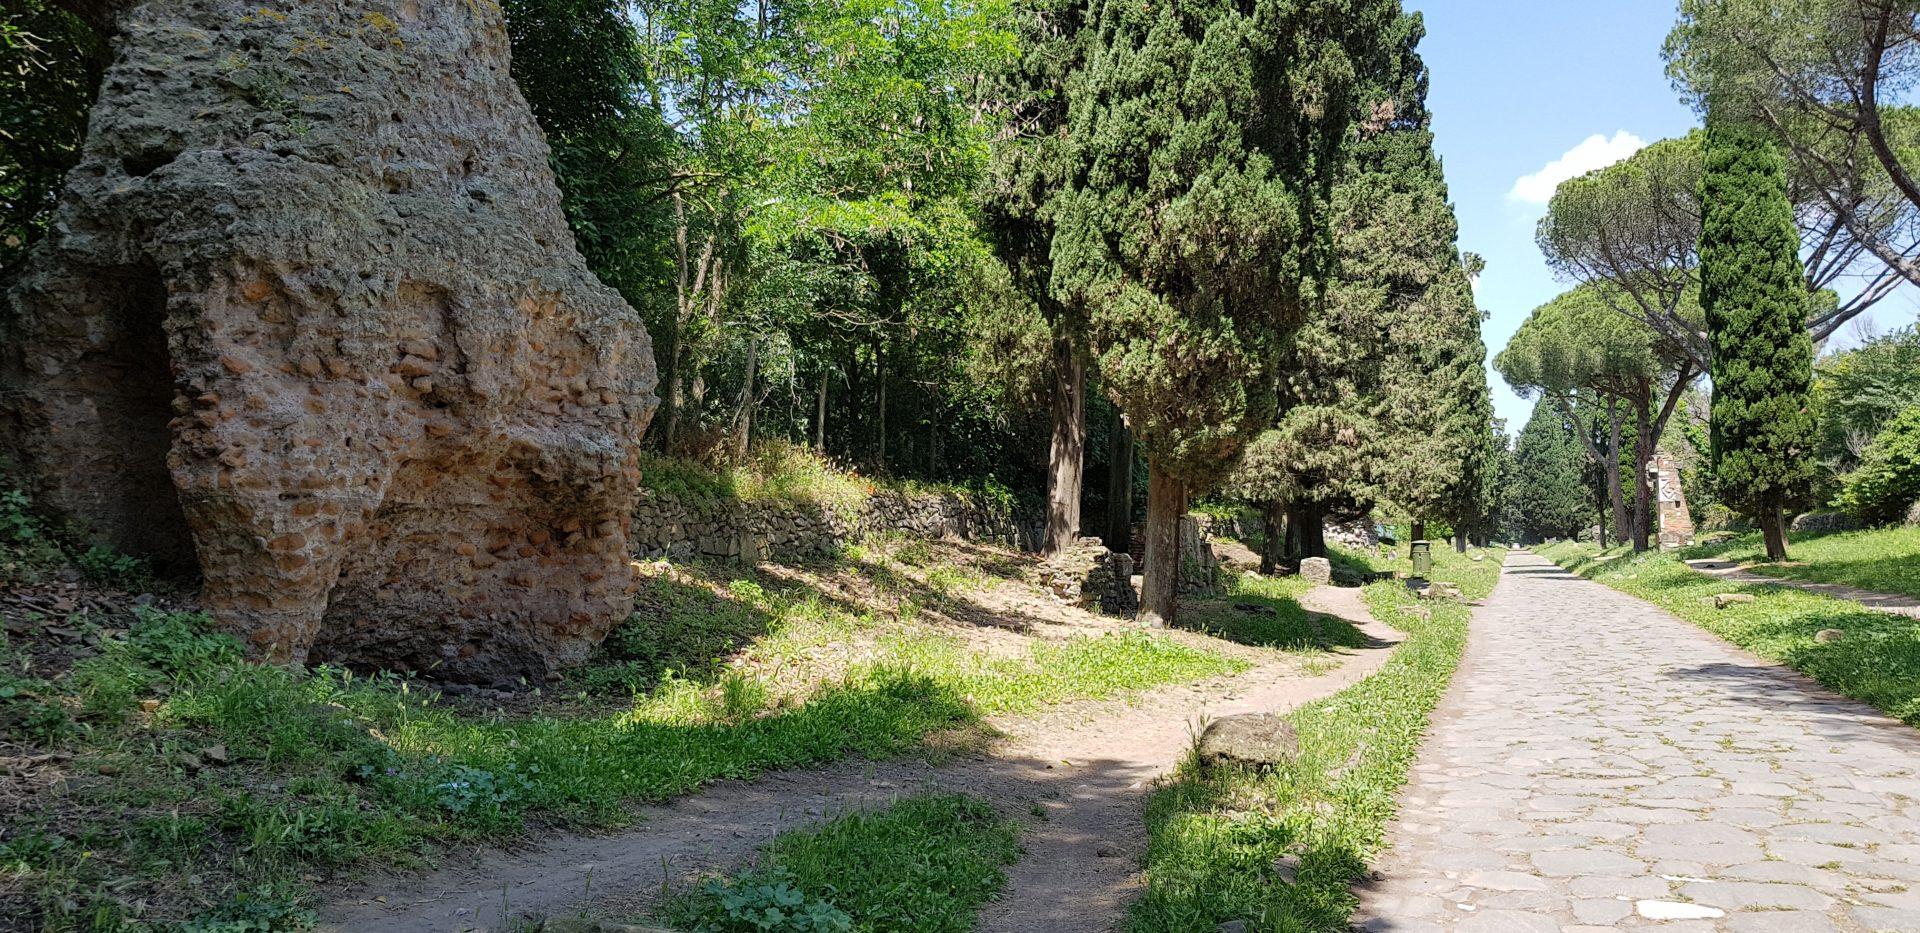 VIDEO: VIA APPIA ANTICA, ROMA (ITALIA)